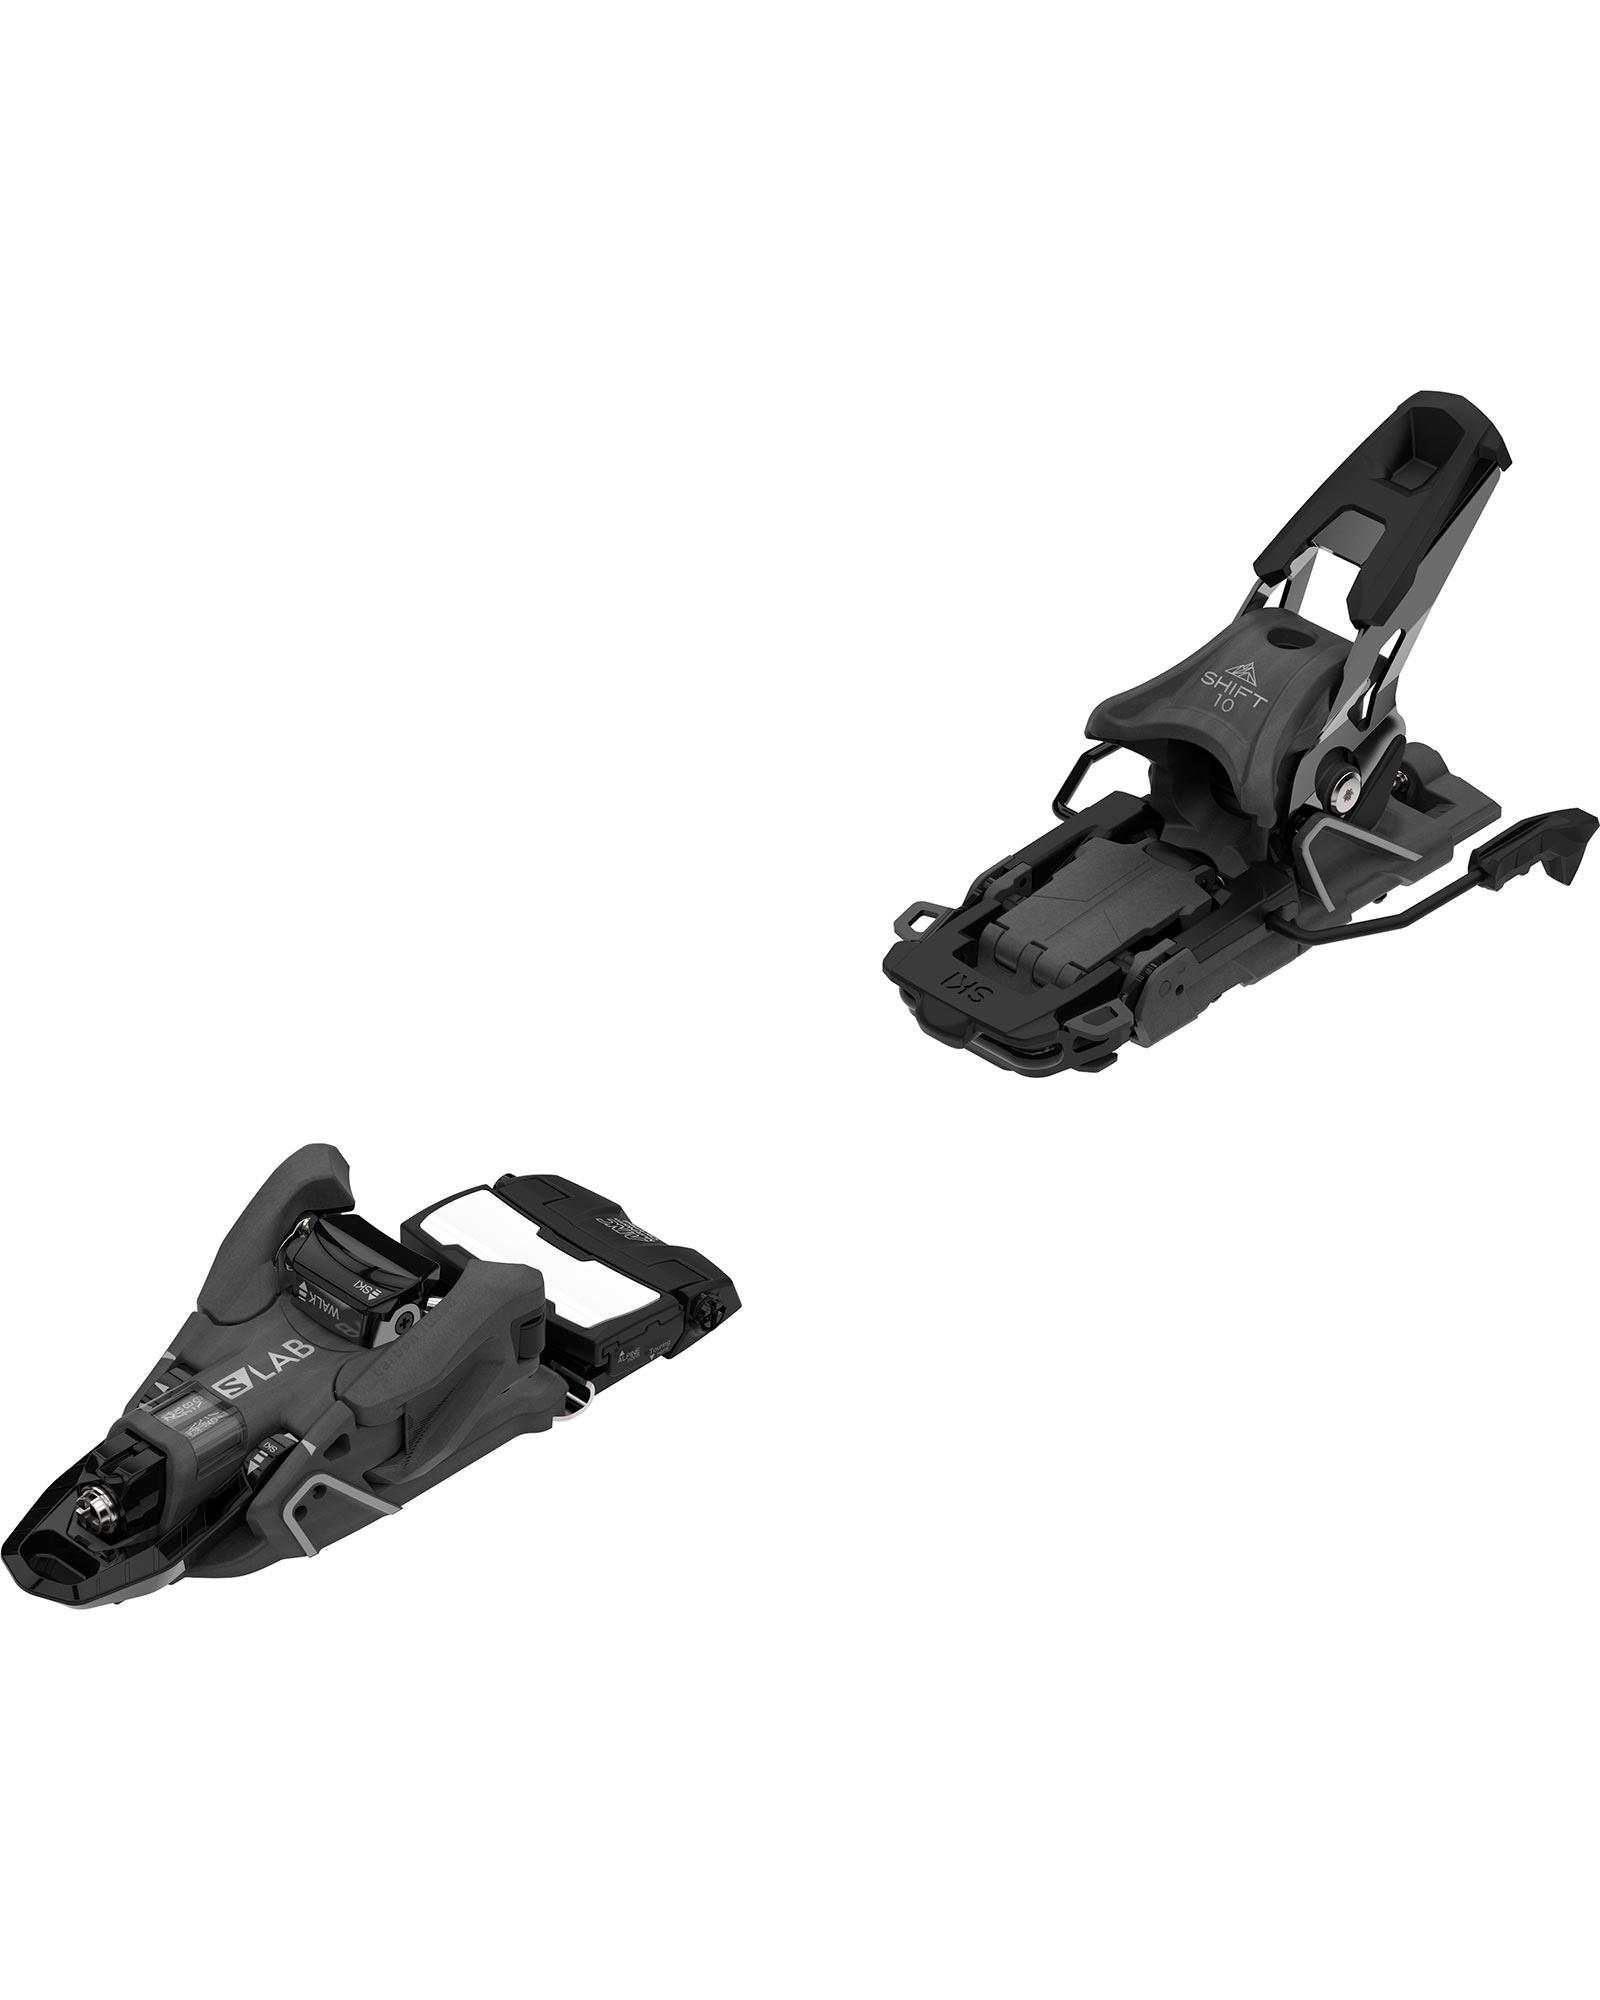 Salomon S/LAB Shift MNC 10 100mm Backcountry Ski Bindings 2020 / 2021 0